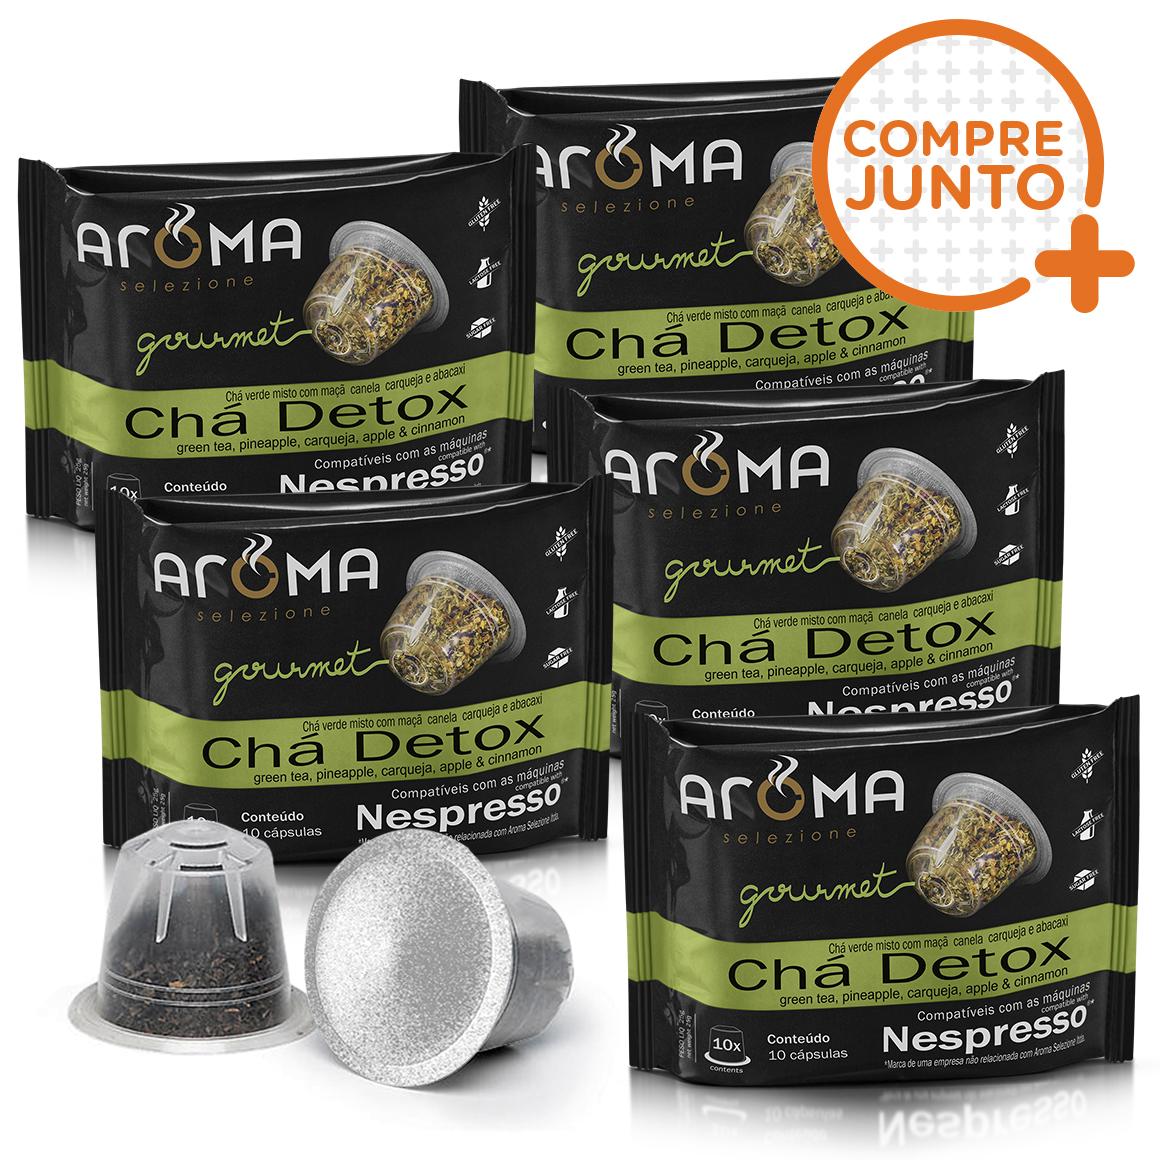 Kit Cápsulas de CháDetox Aroma - Compatíveis com...